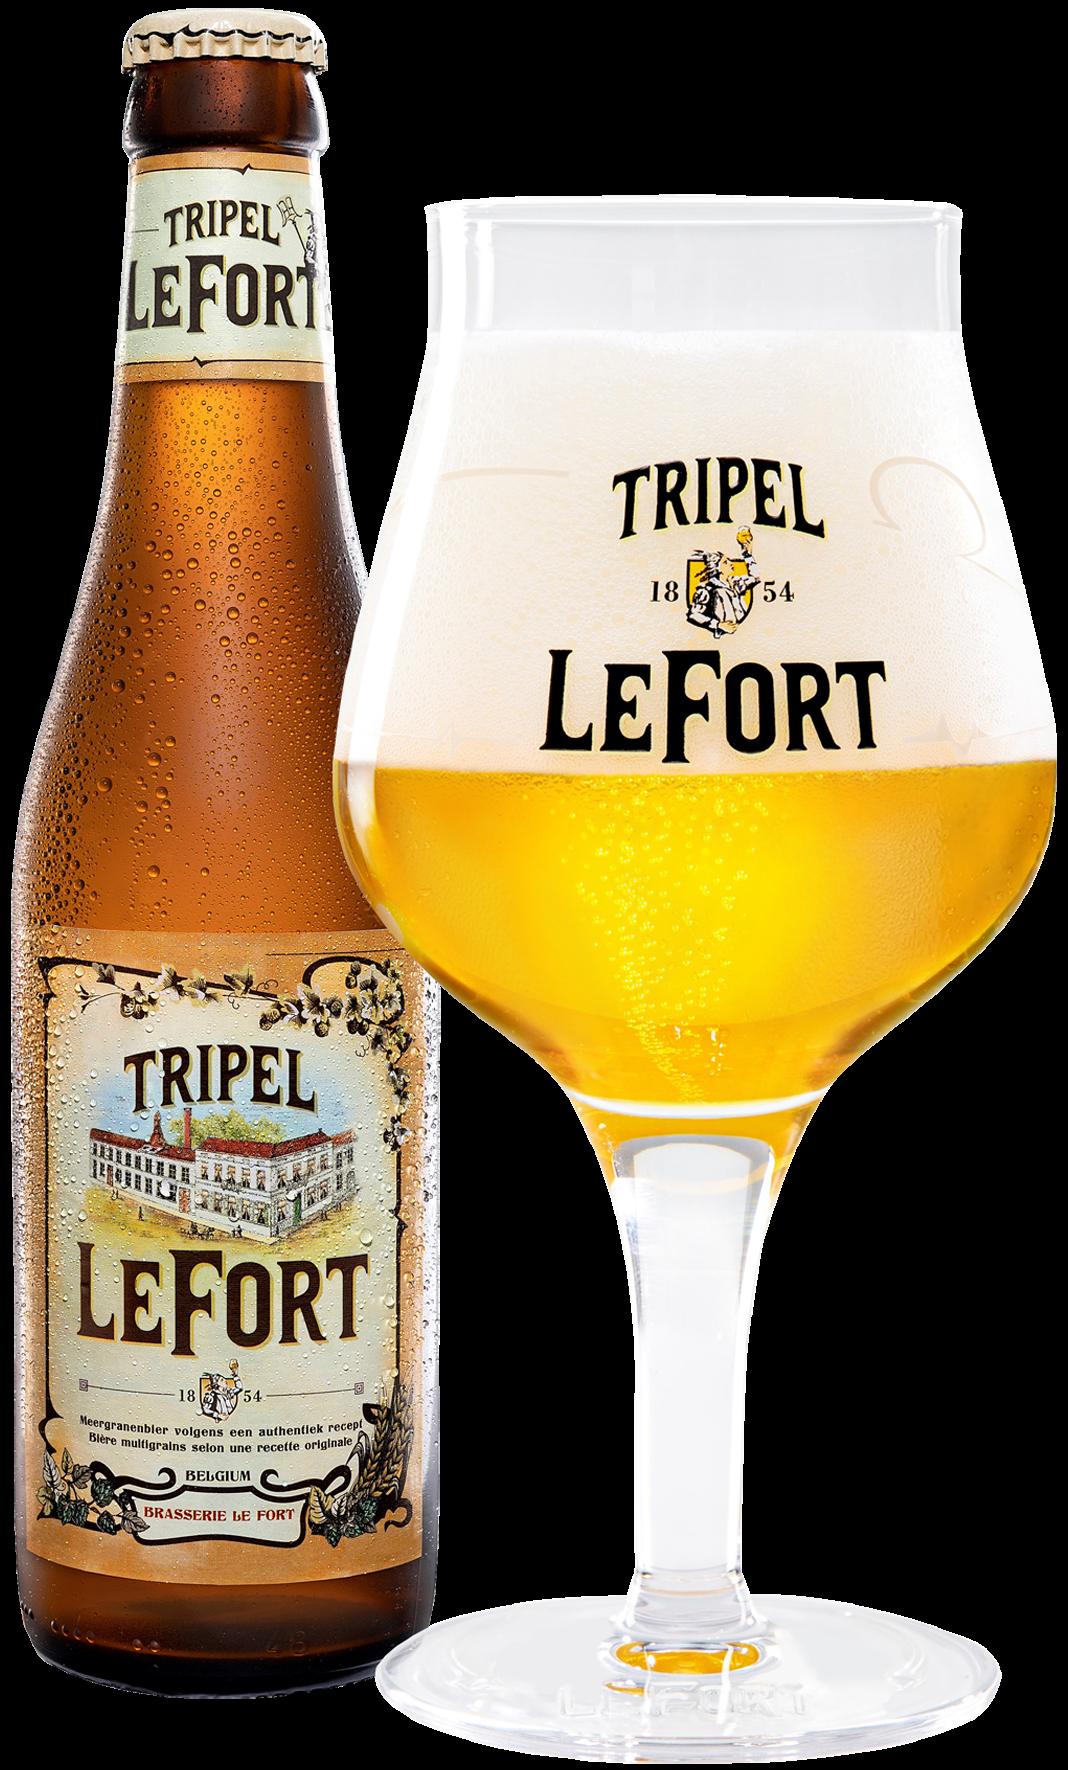 Tripel LeFort bottle + glass 2020 website.png